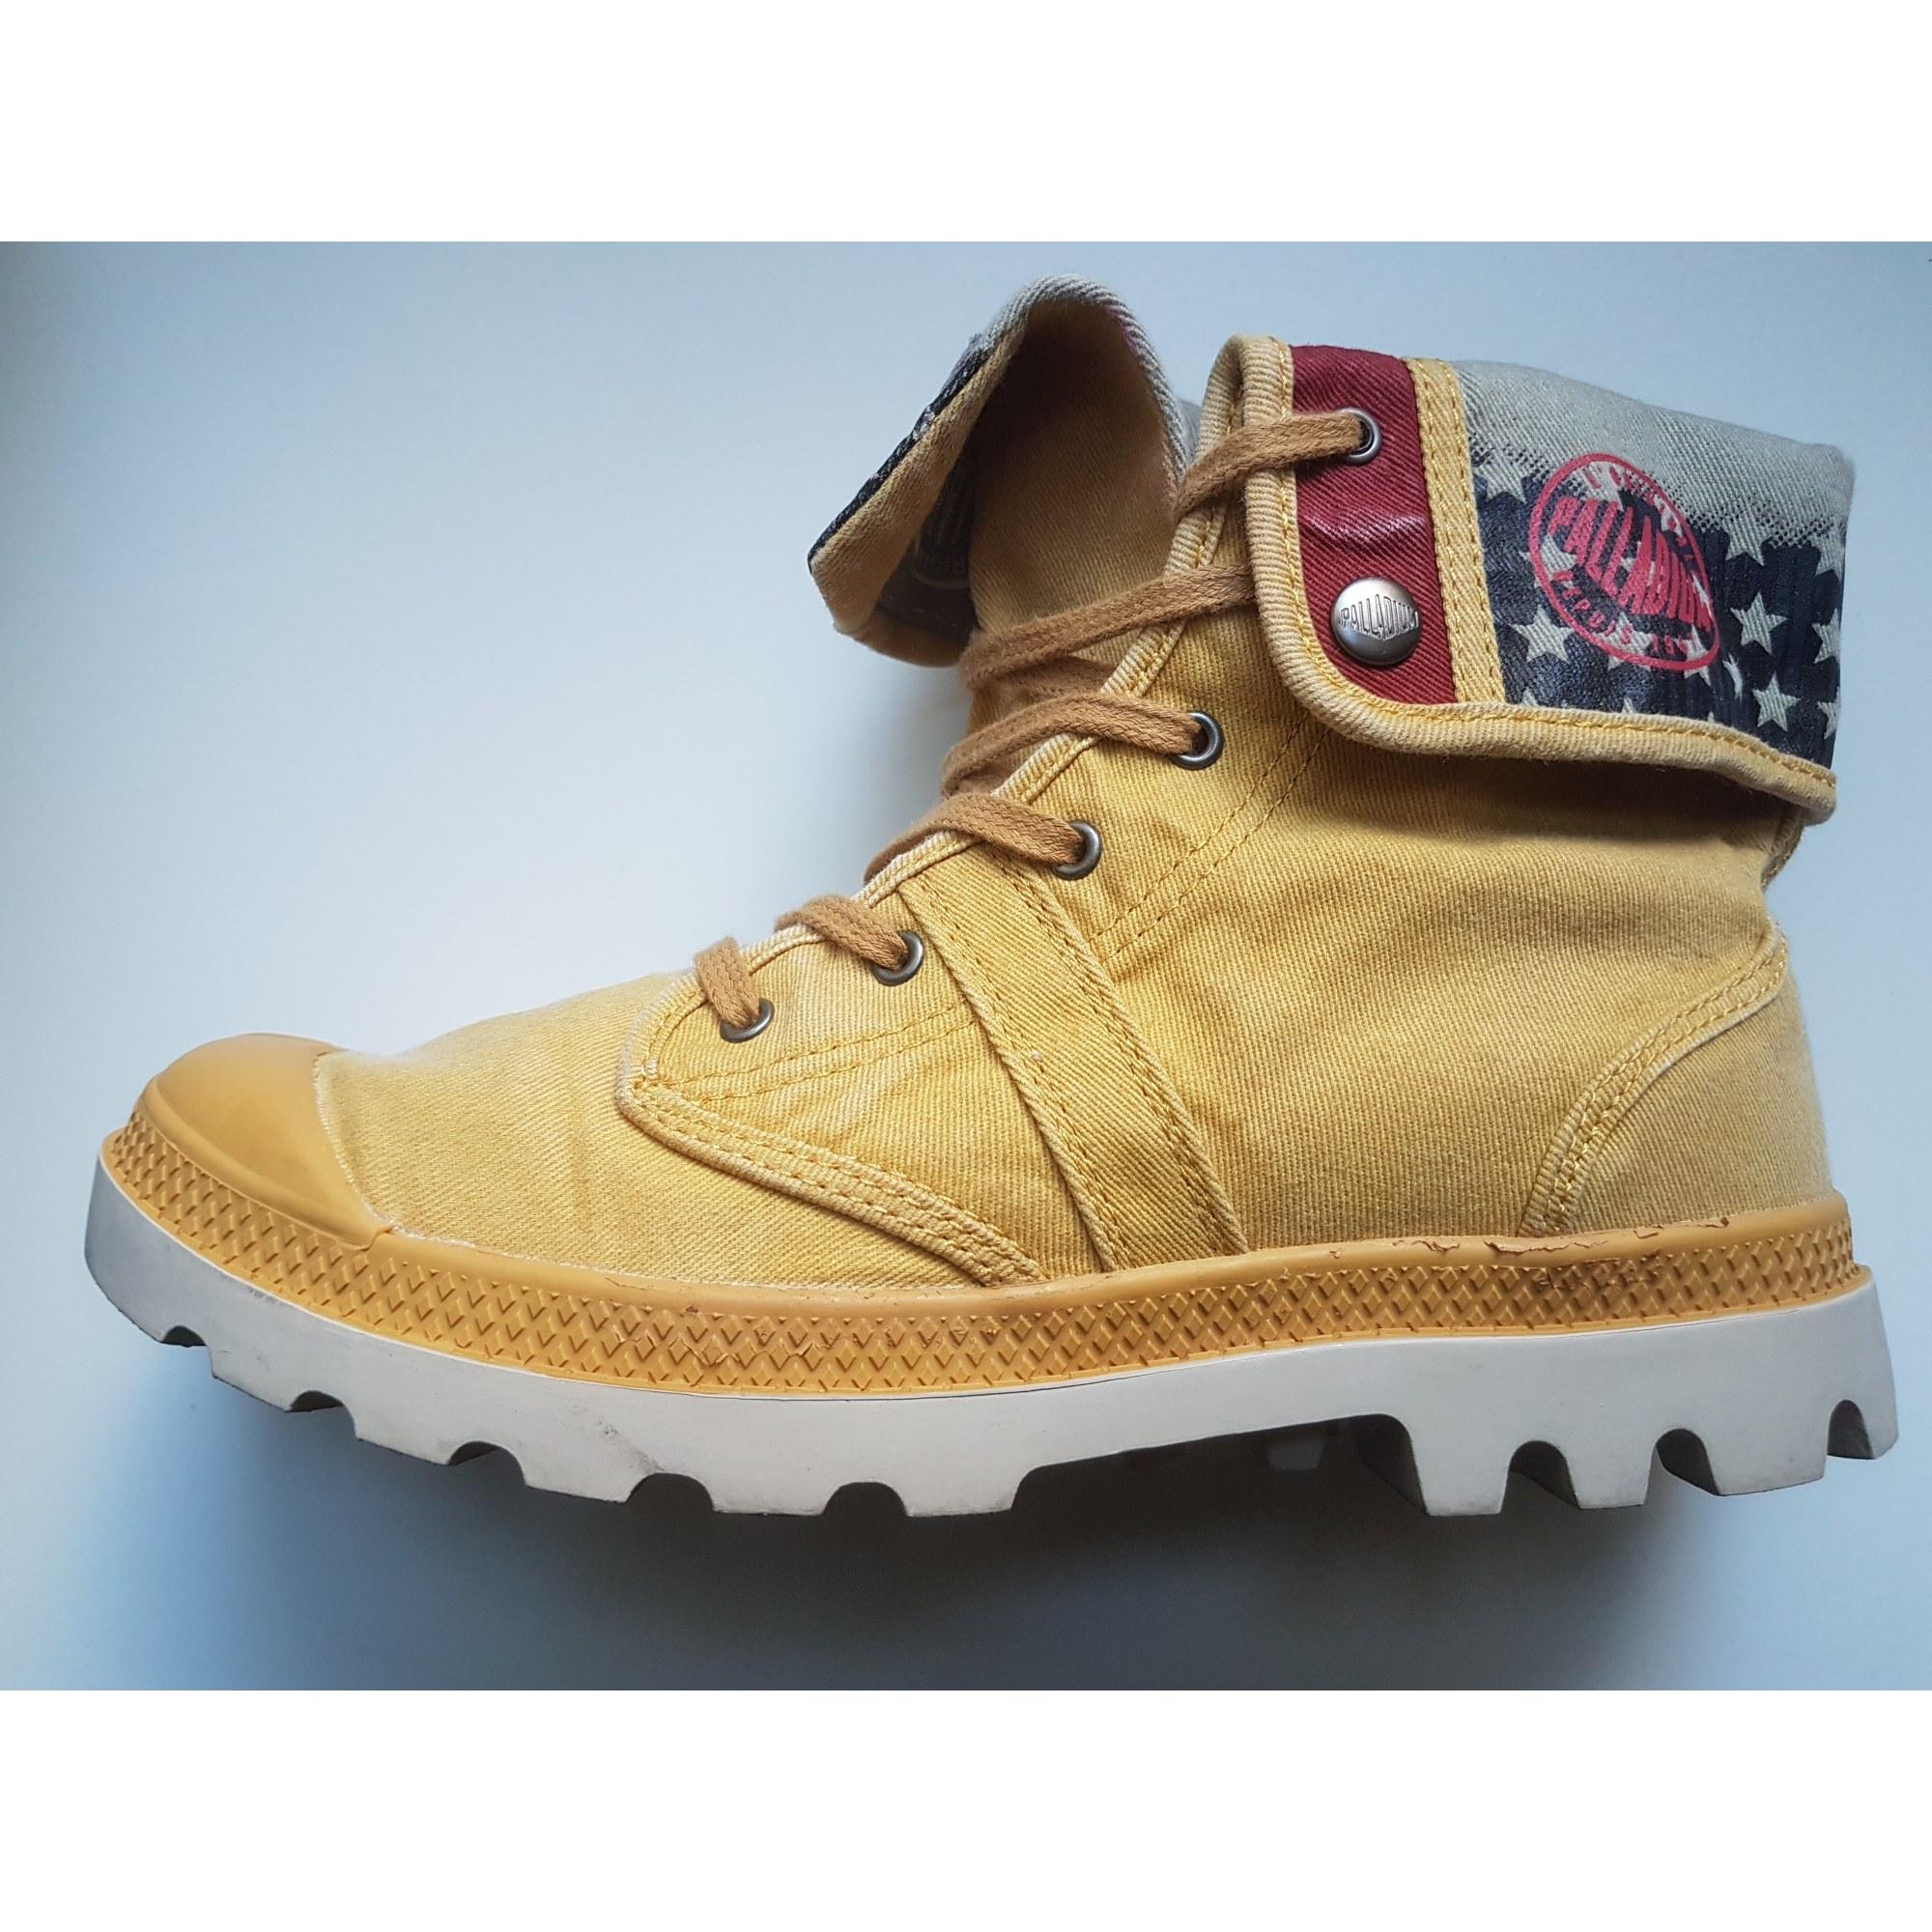 À Lacets Palladium 6261163 38 Jaune Chaussures UgqA4x